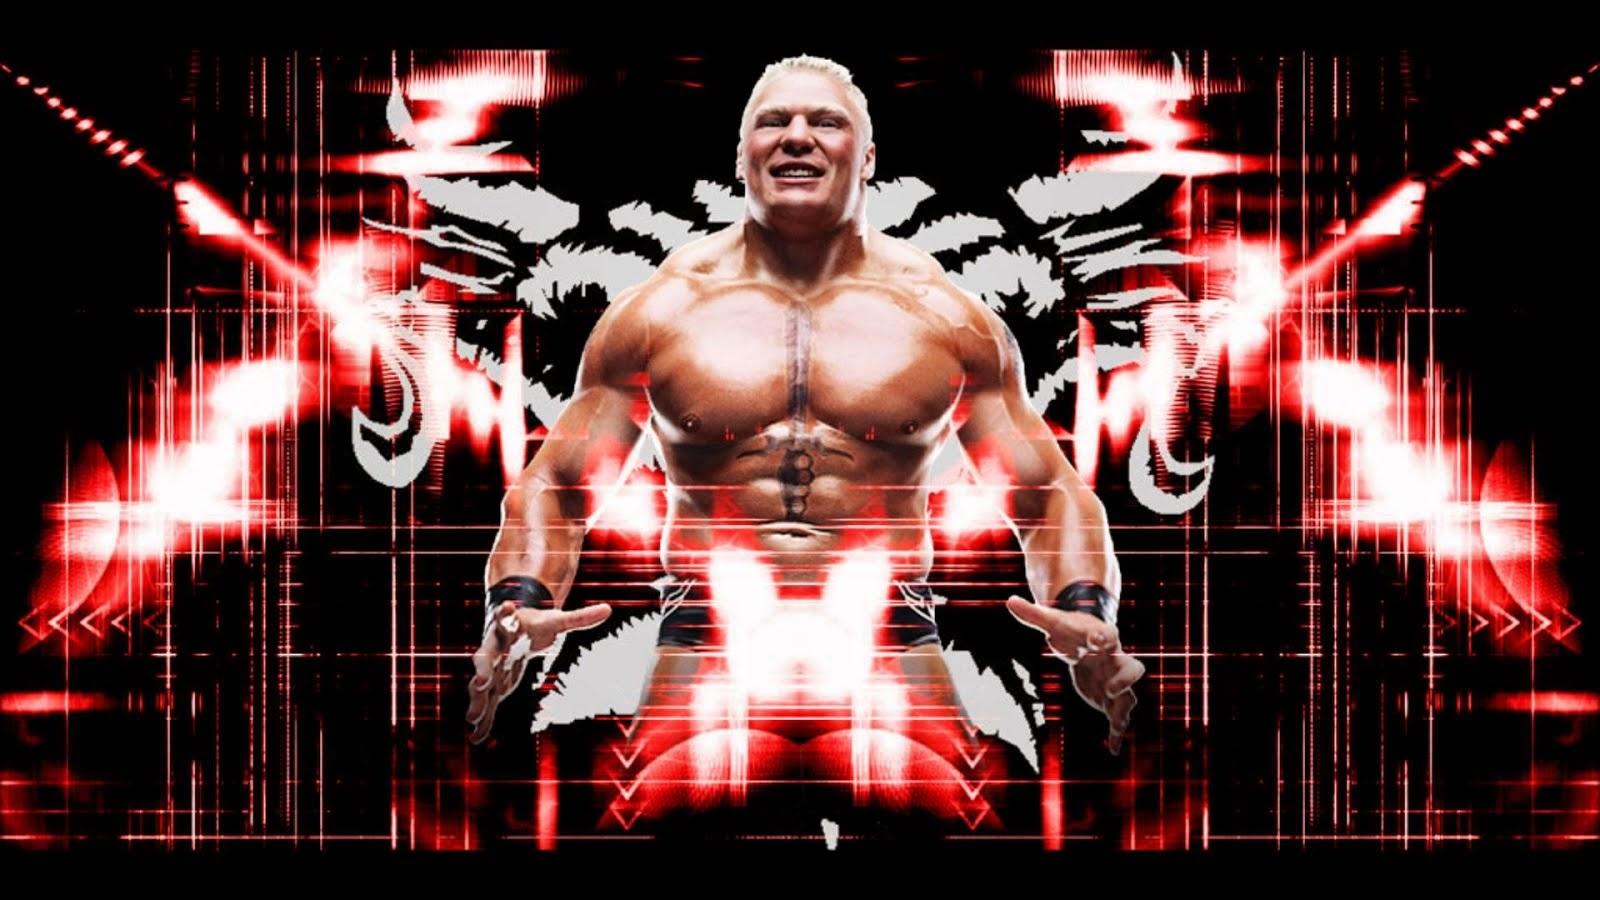 Brock Lesnar Wallpapers 2015 1600x900